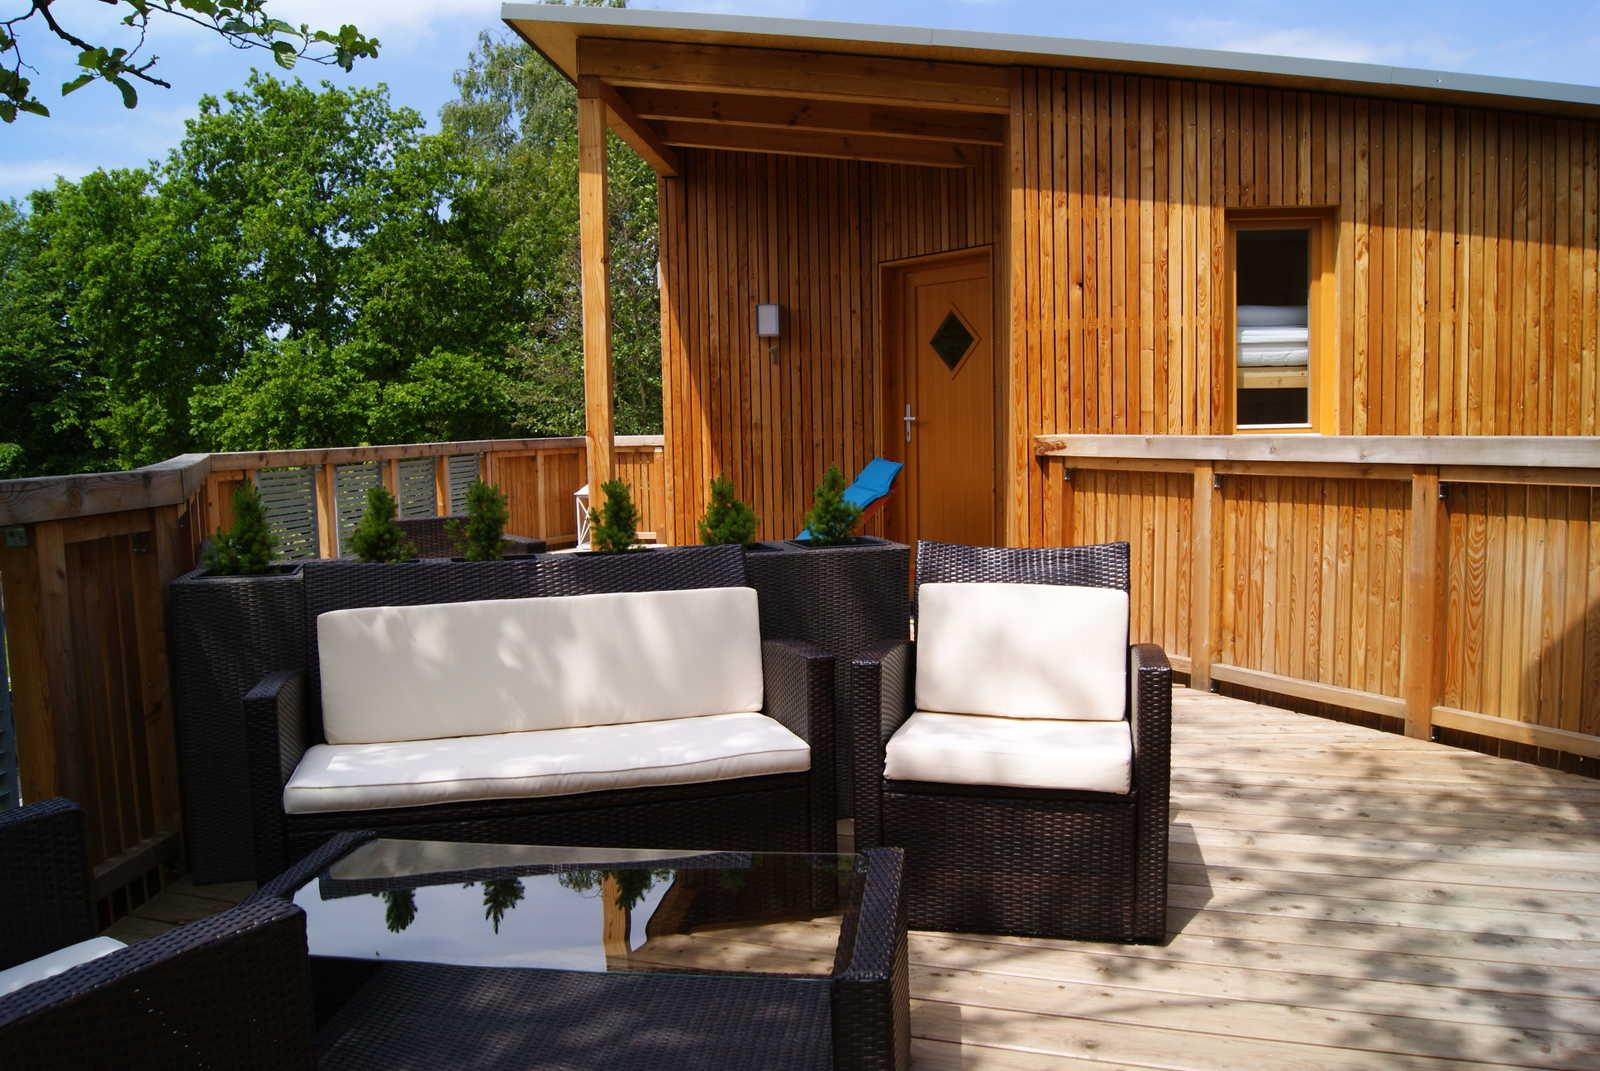 baumhaushotel oberbayern antenne bayern. Black Bedroom Furniture Sets. Home Design Ideas